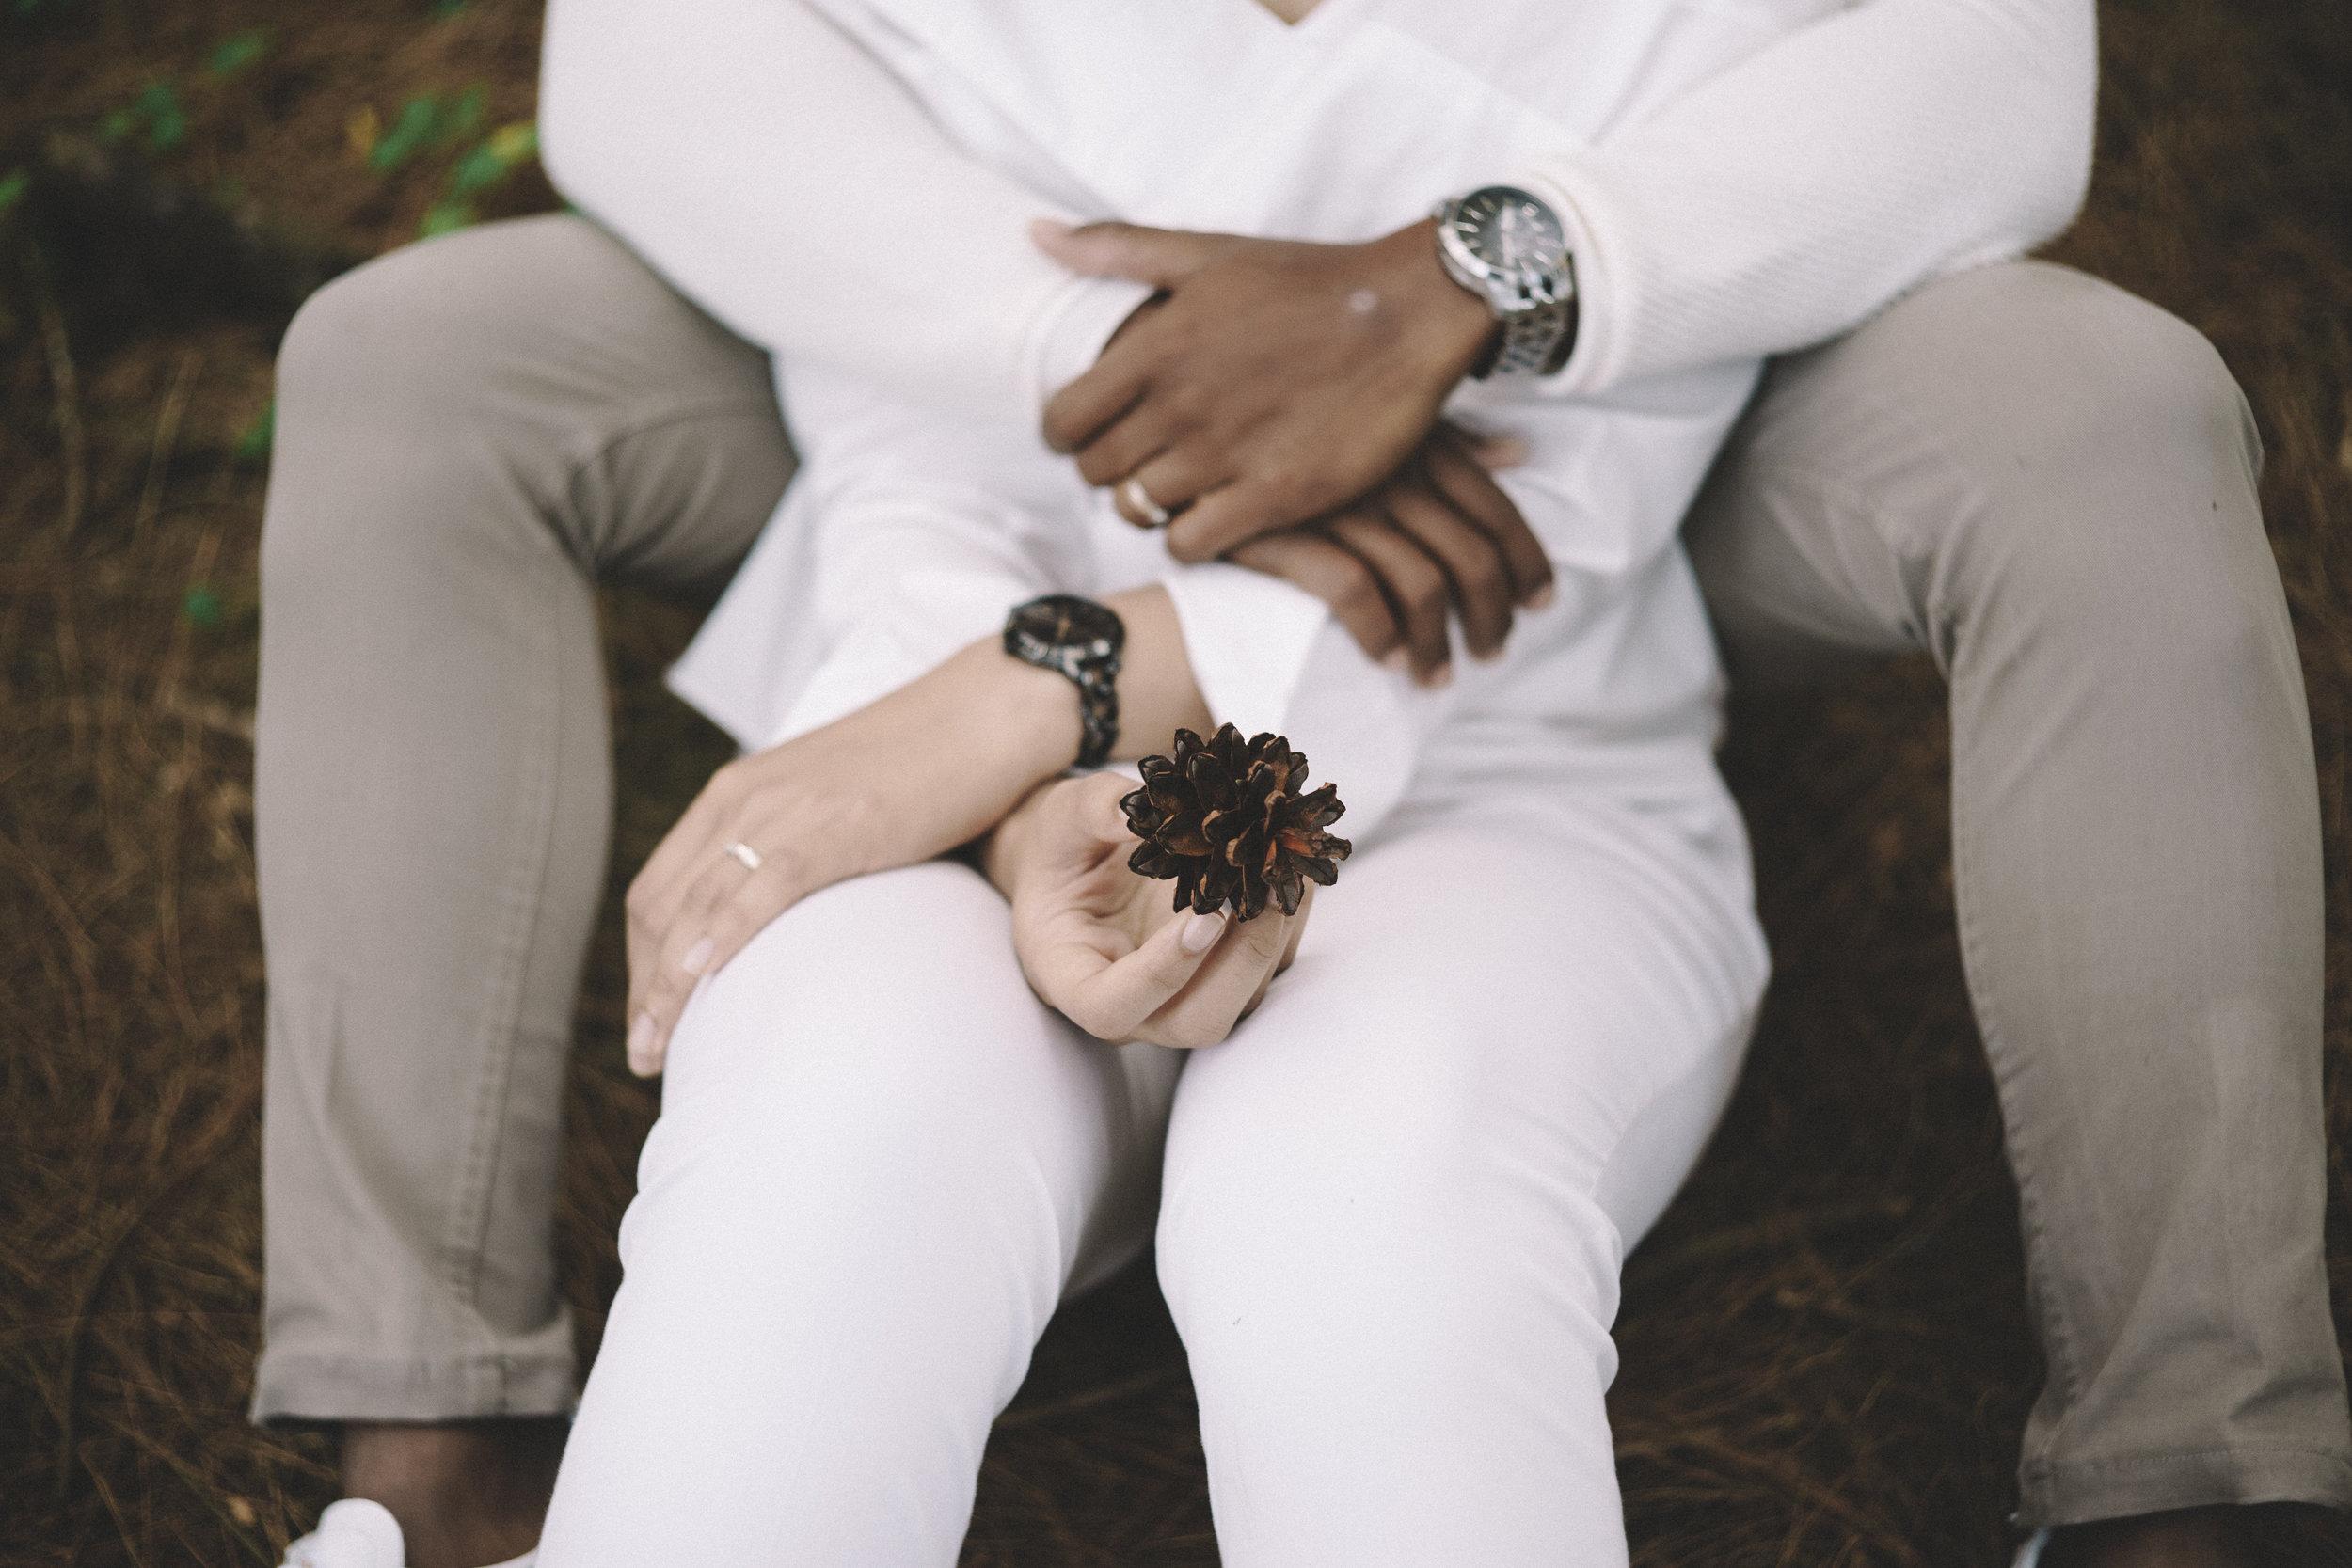 winny-panggah-couple-session-248.jpg